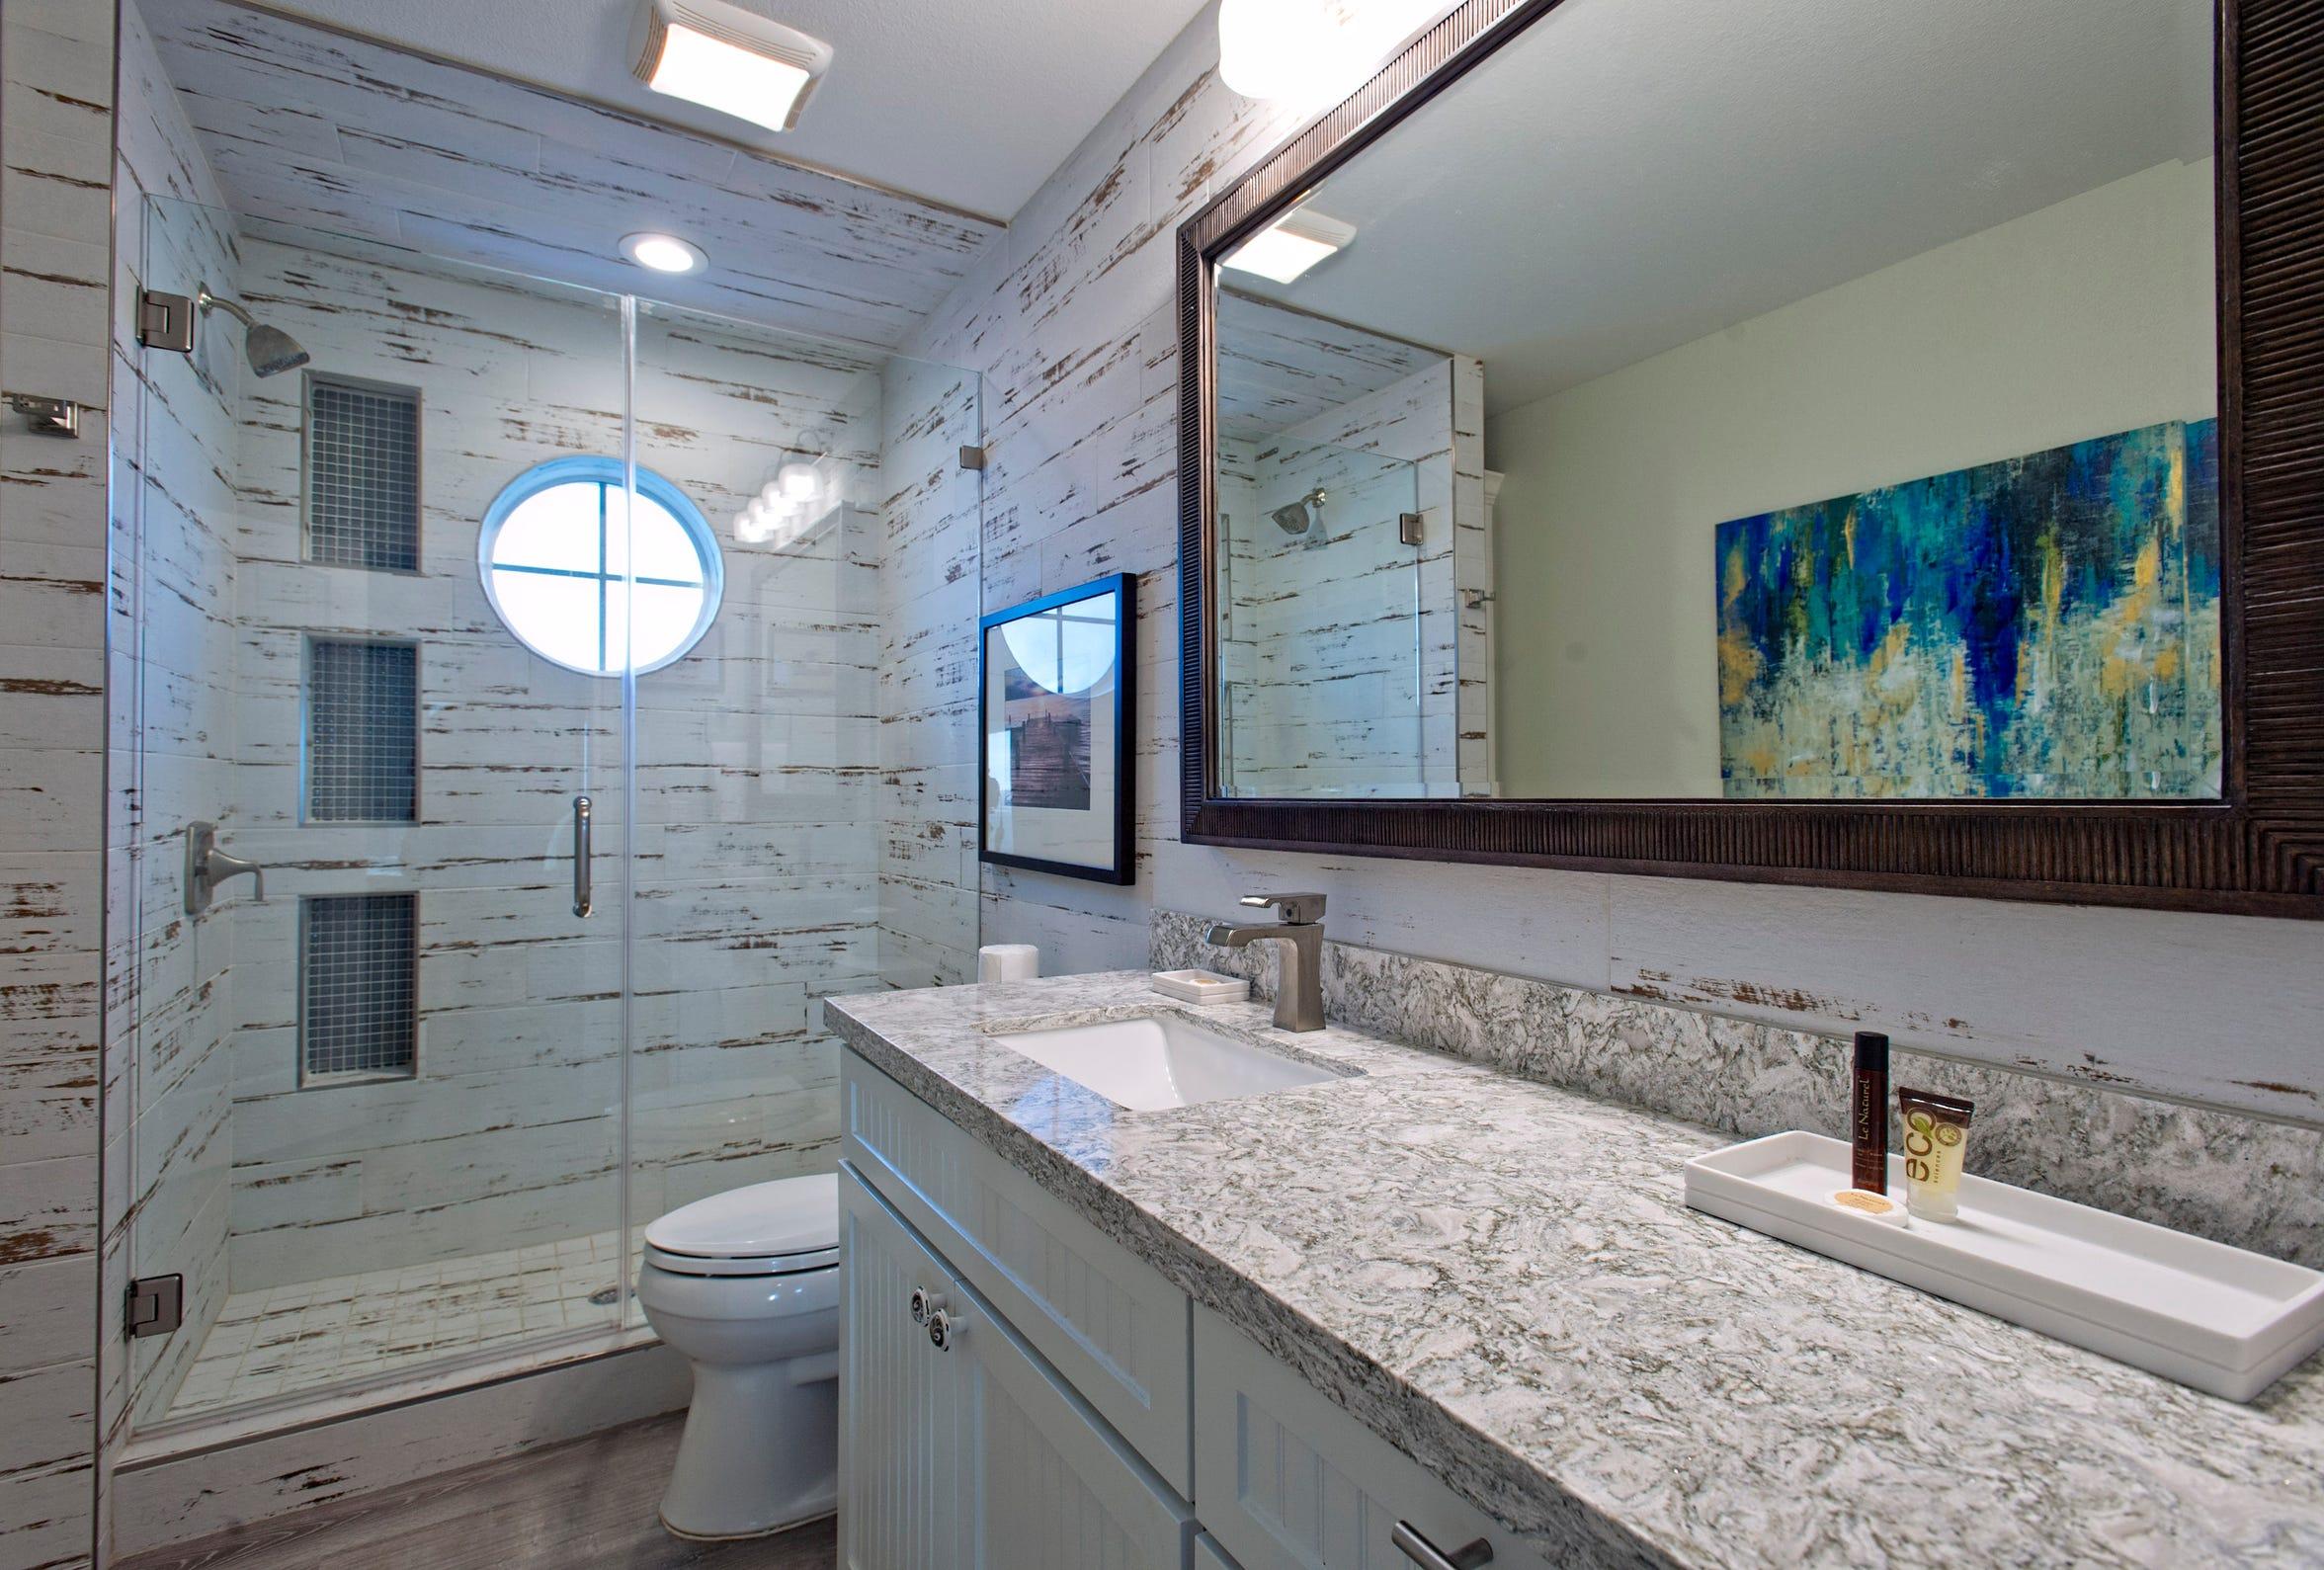 The unique ceramic shiplap planked walk in shower compliments the quartz countertops in the master bath